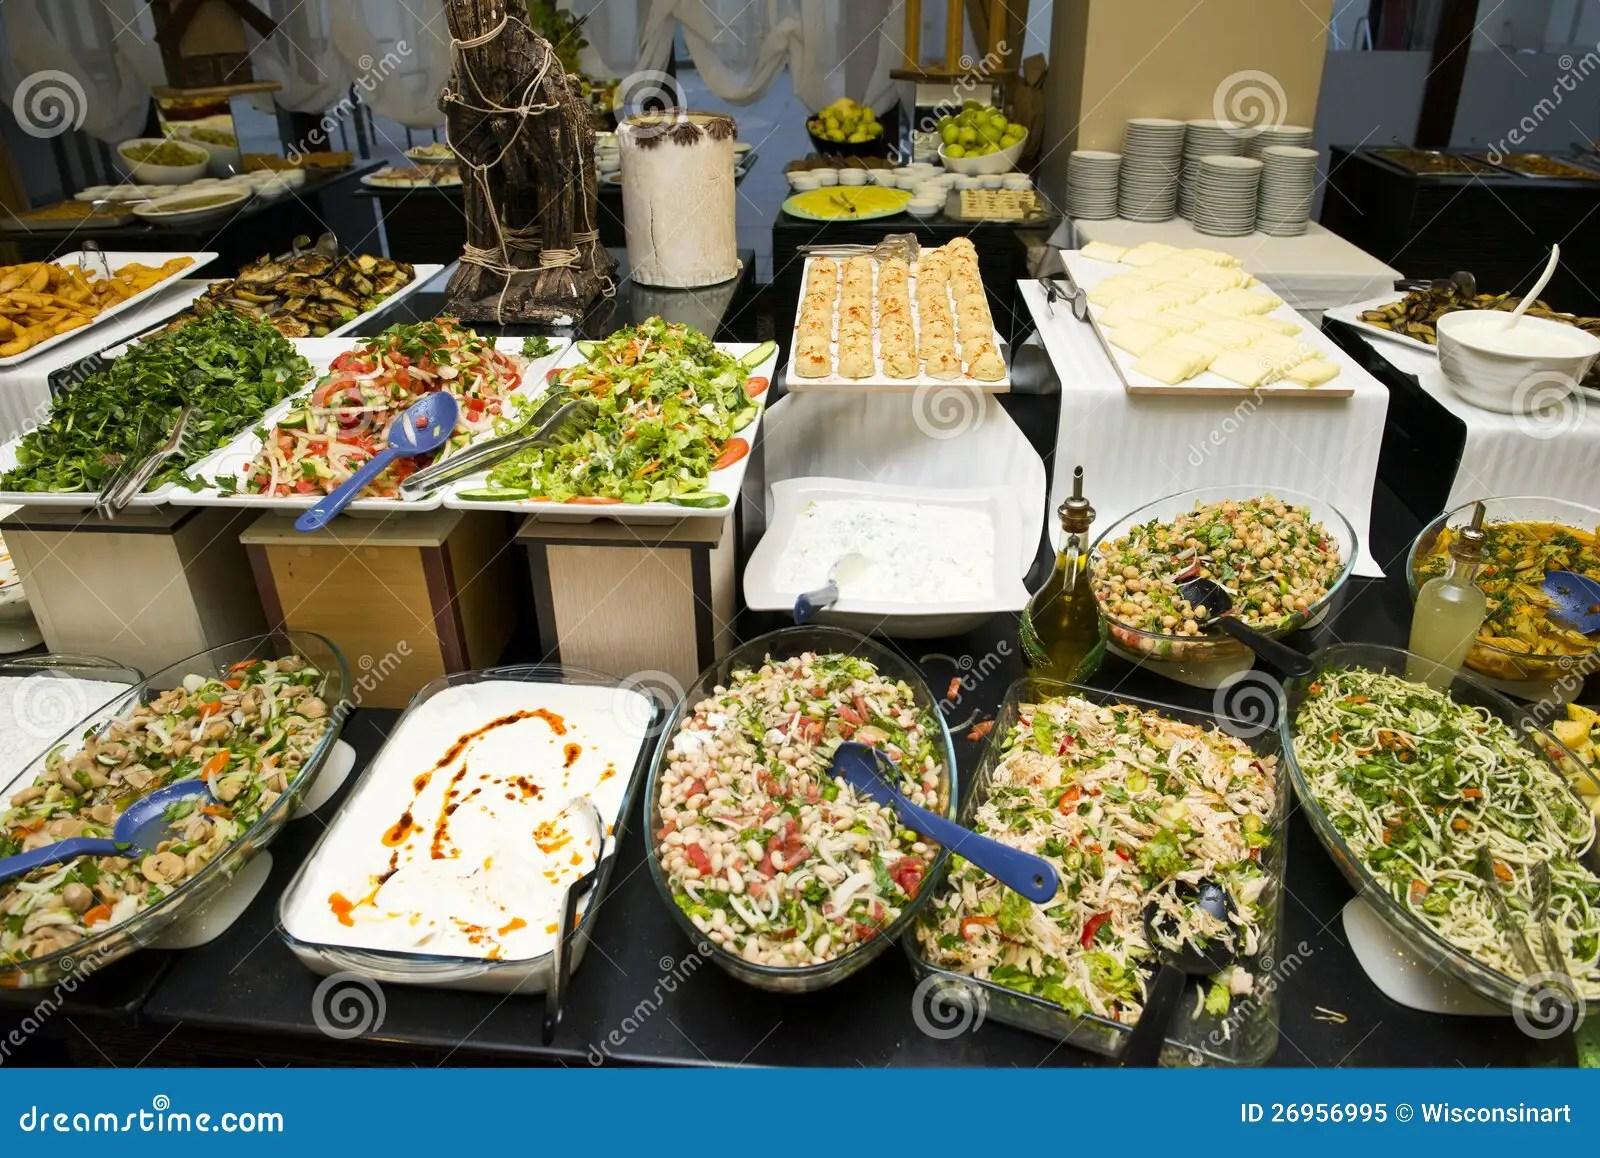 Food Buffet Stock Image Image Of Dish Veggies